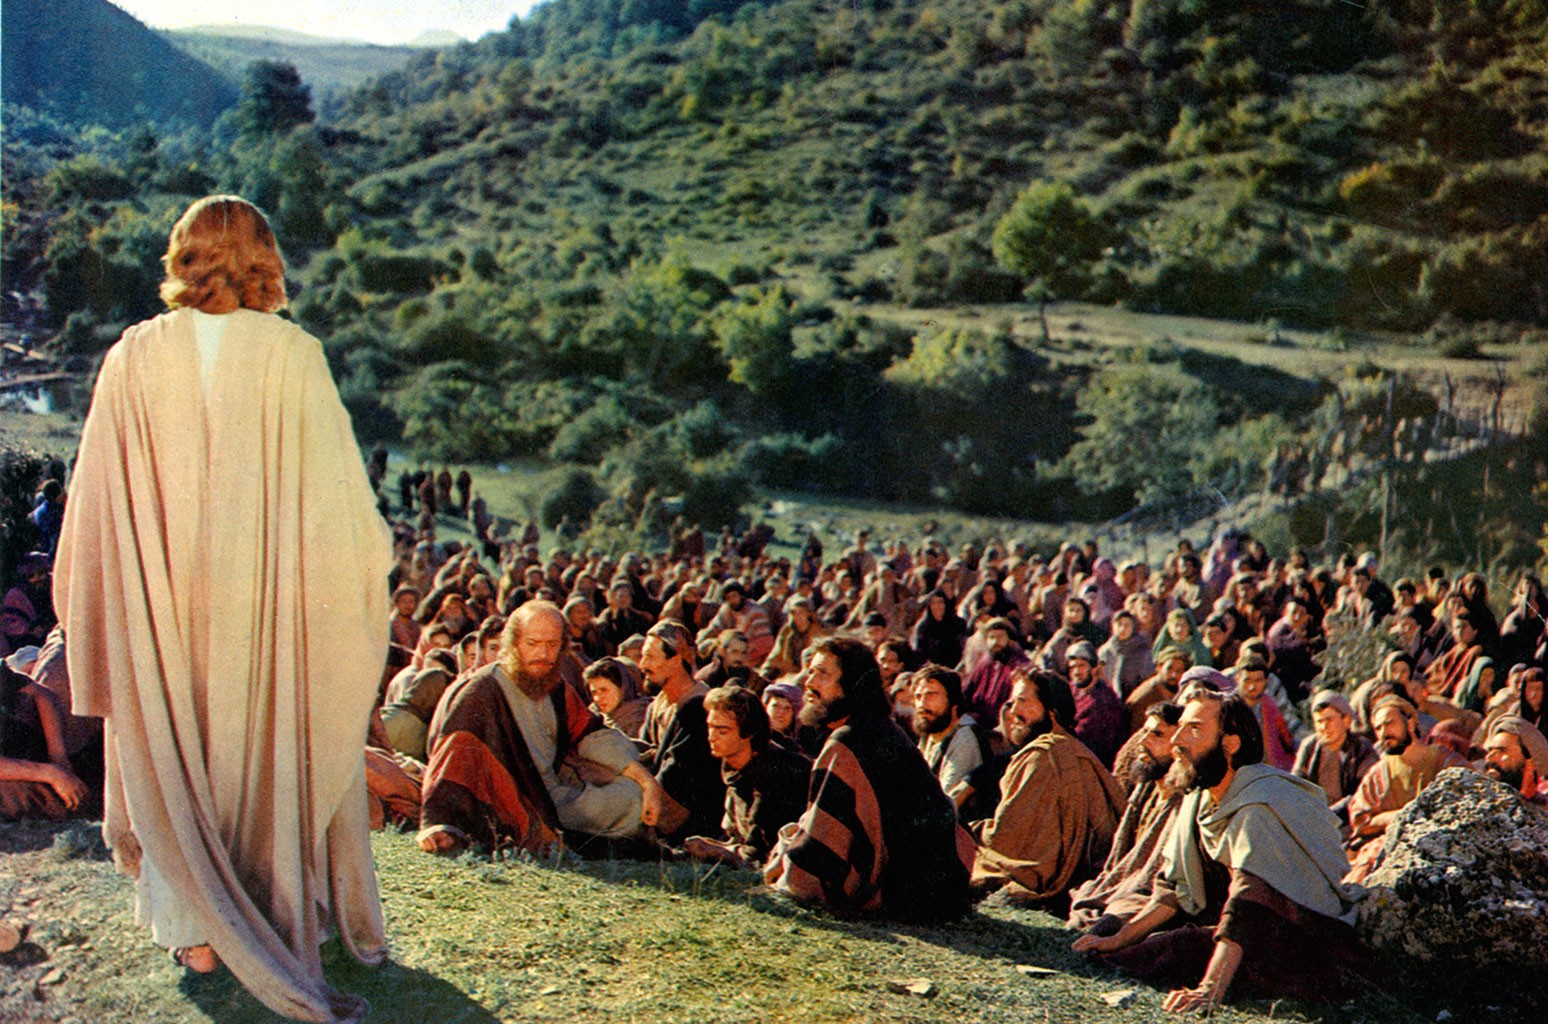 Claude Heater, Opera Singer Who Played Jesus in 'Ben-Hur,' Dies at 92